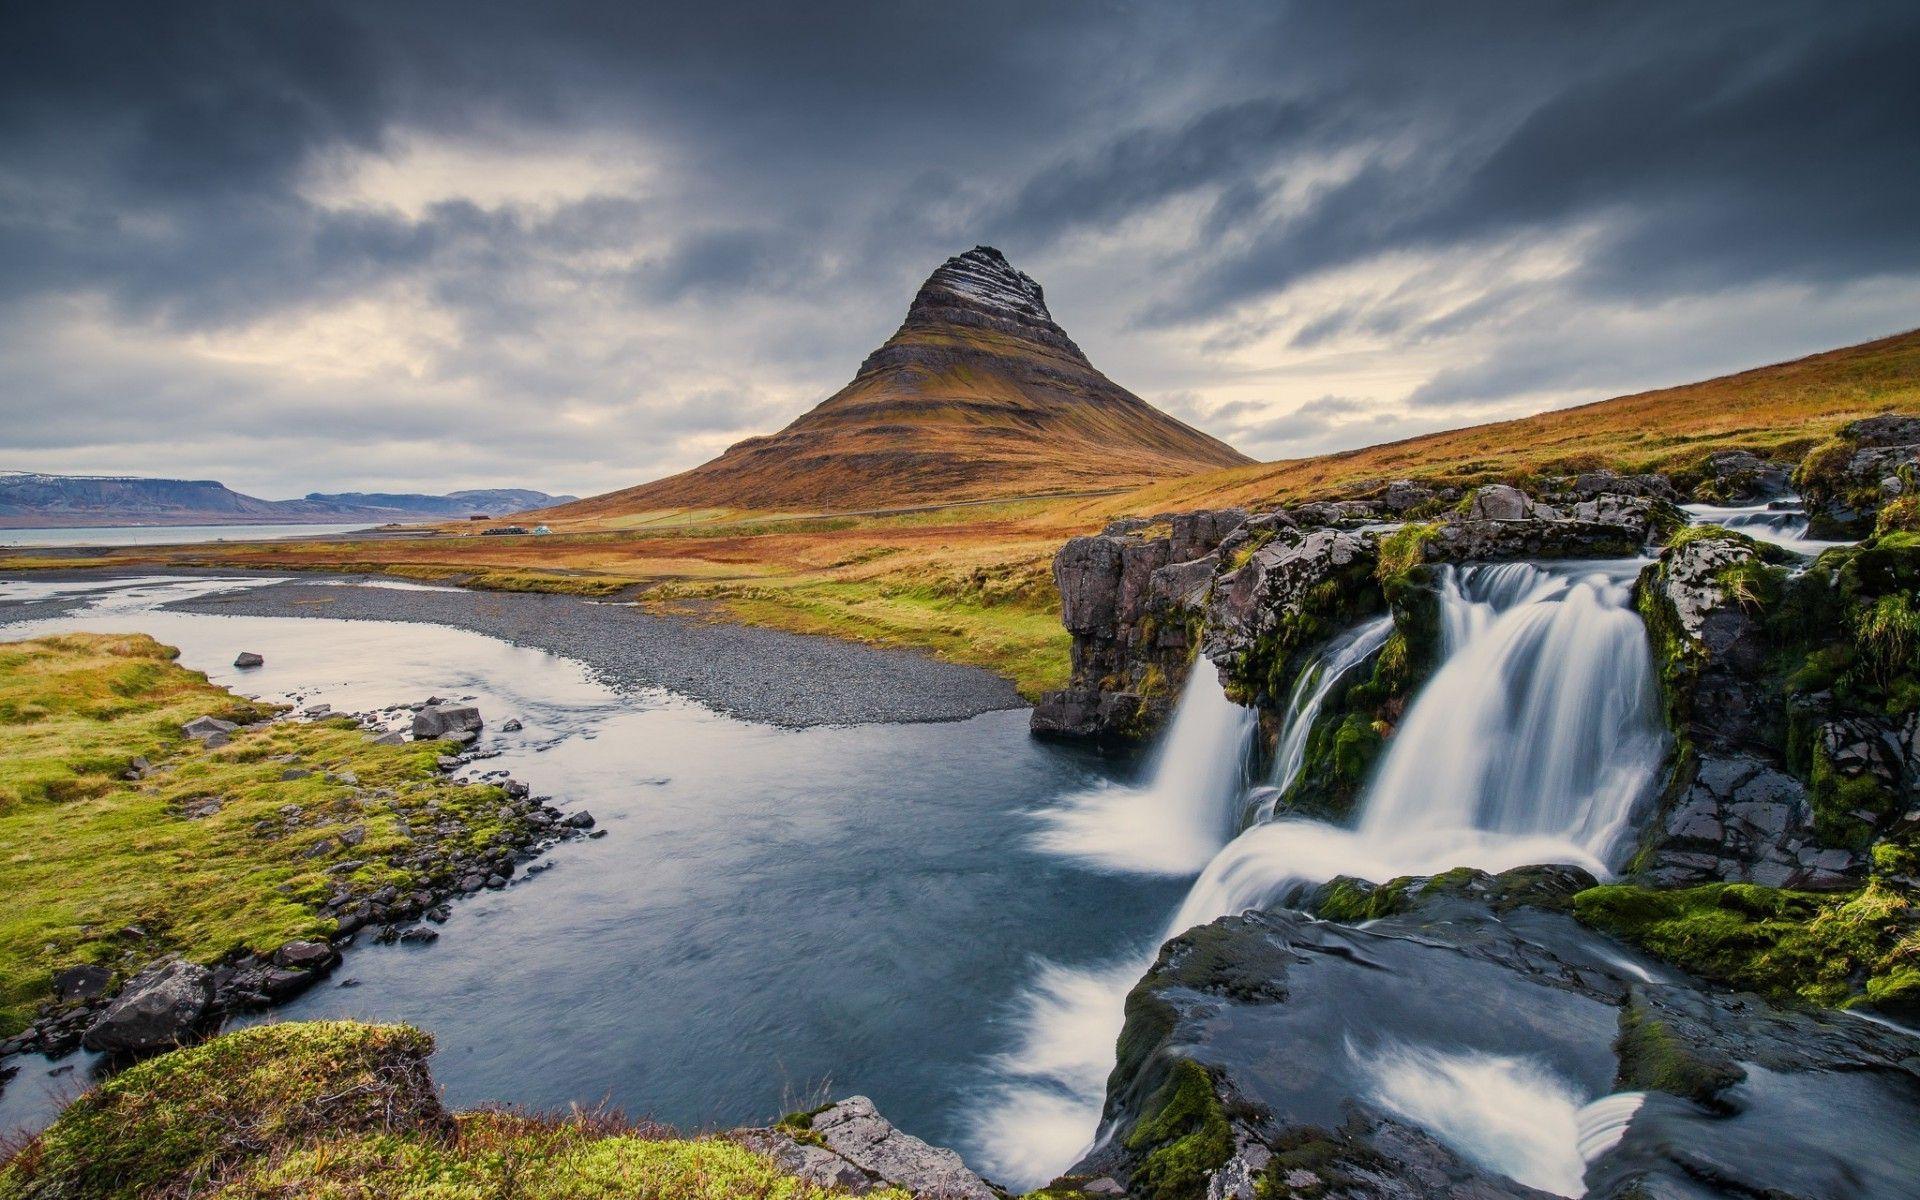 Iceland Wallpaper Find Best Latest Iceland Wallpaper For